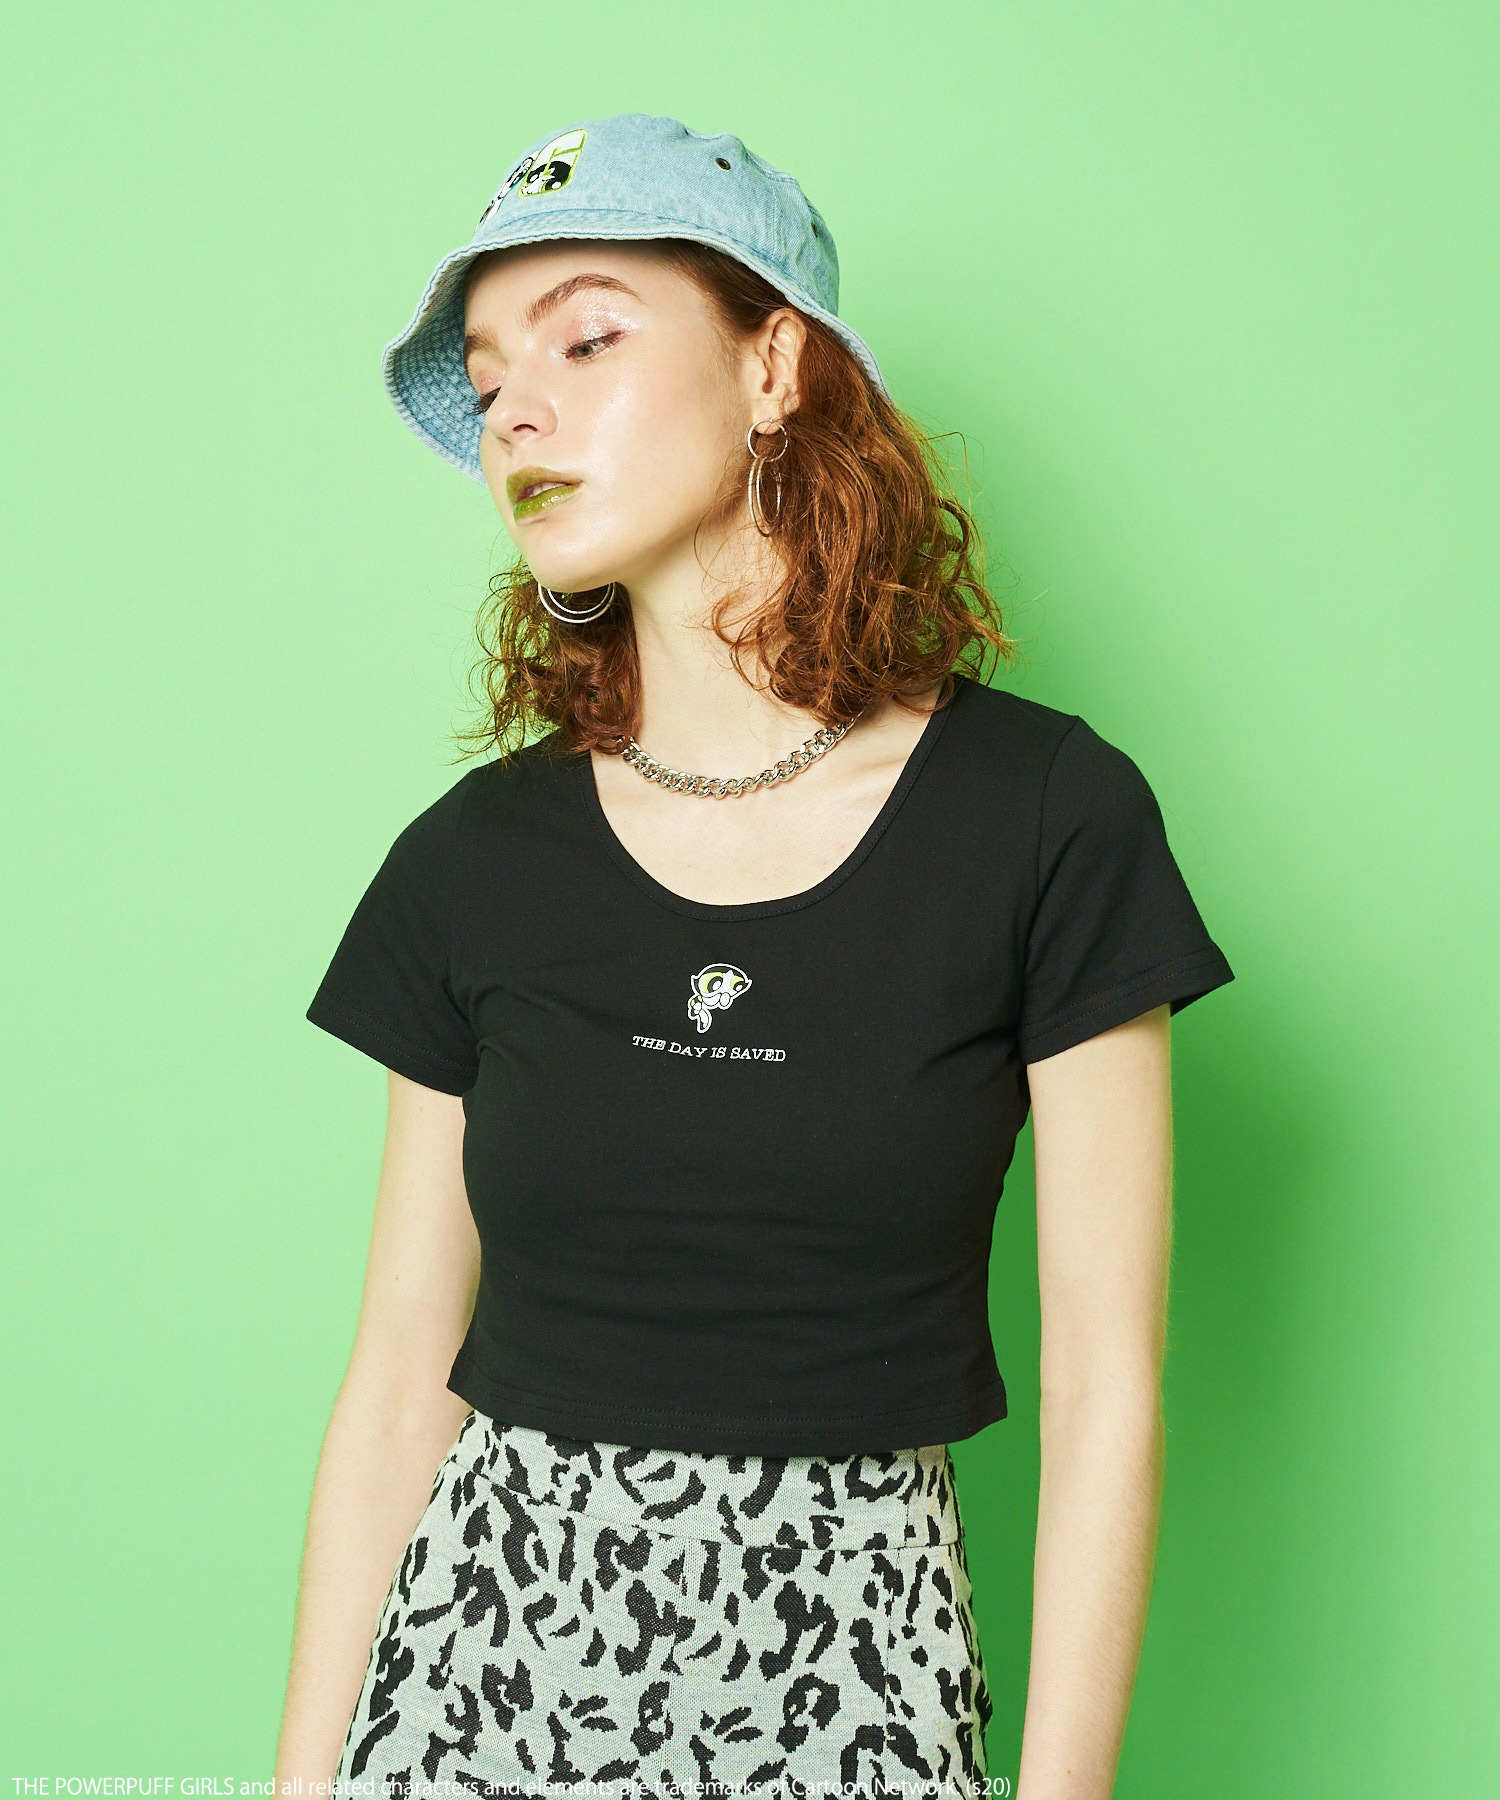 【THE POWERPUFF GIRLS/パワーパフ ガールズ】ショート丈Tシャツ